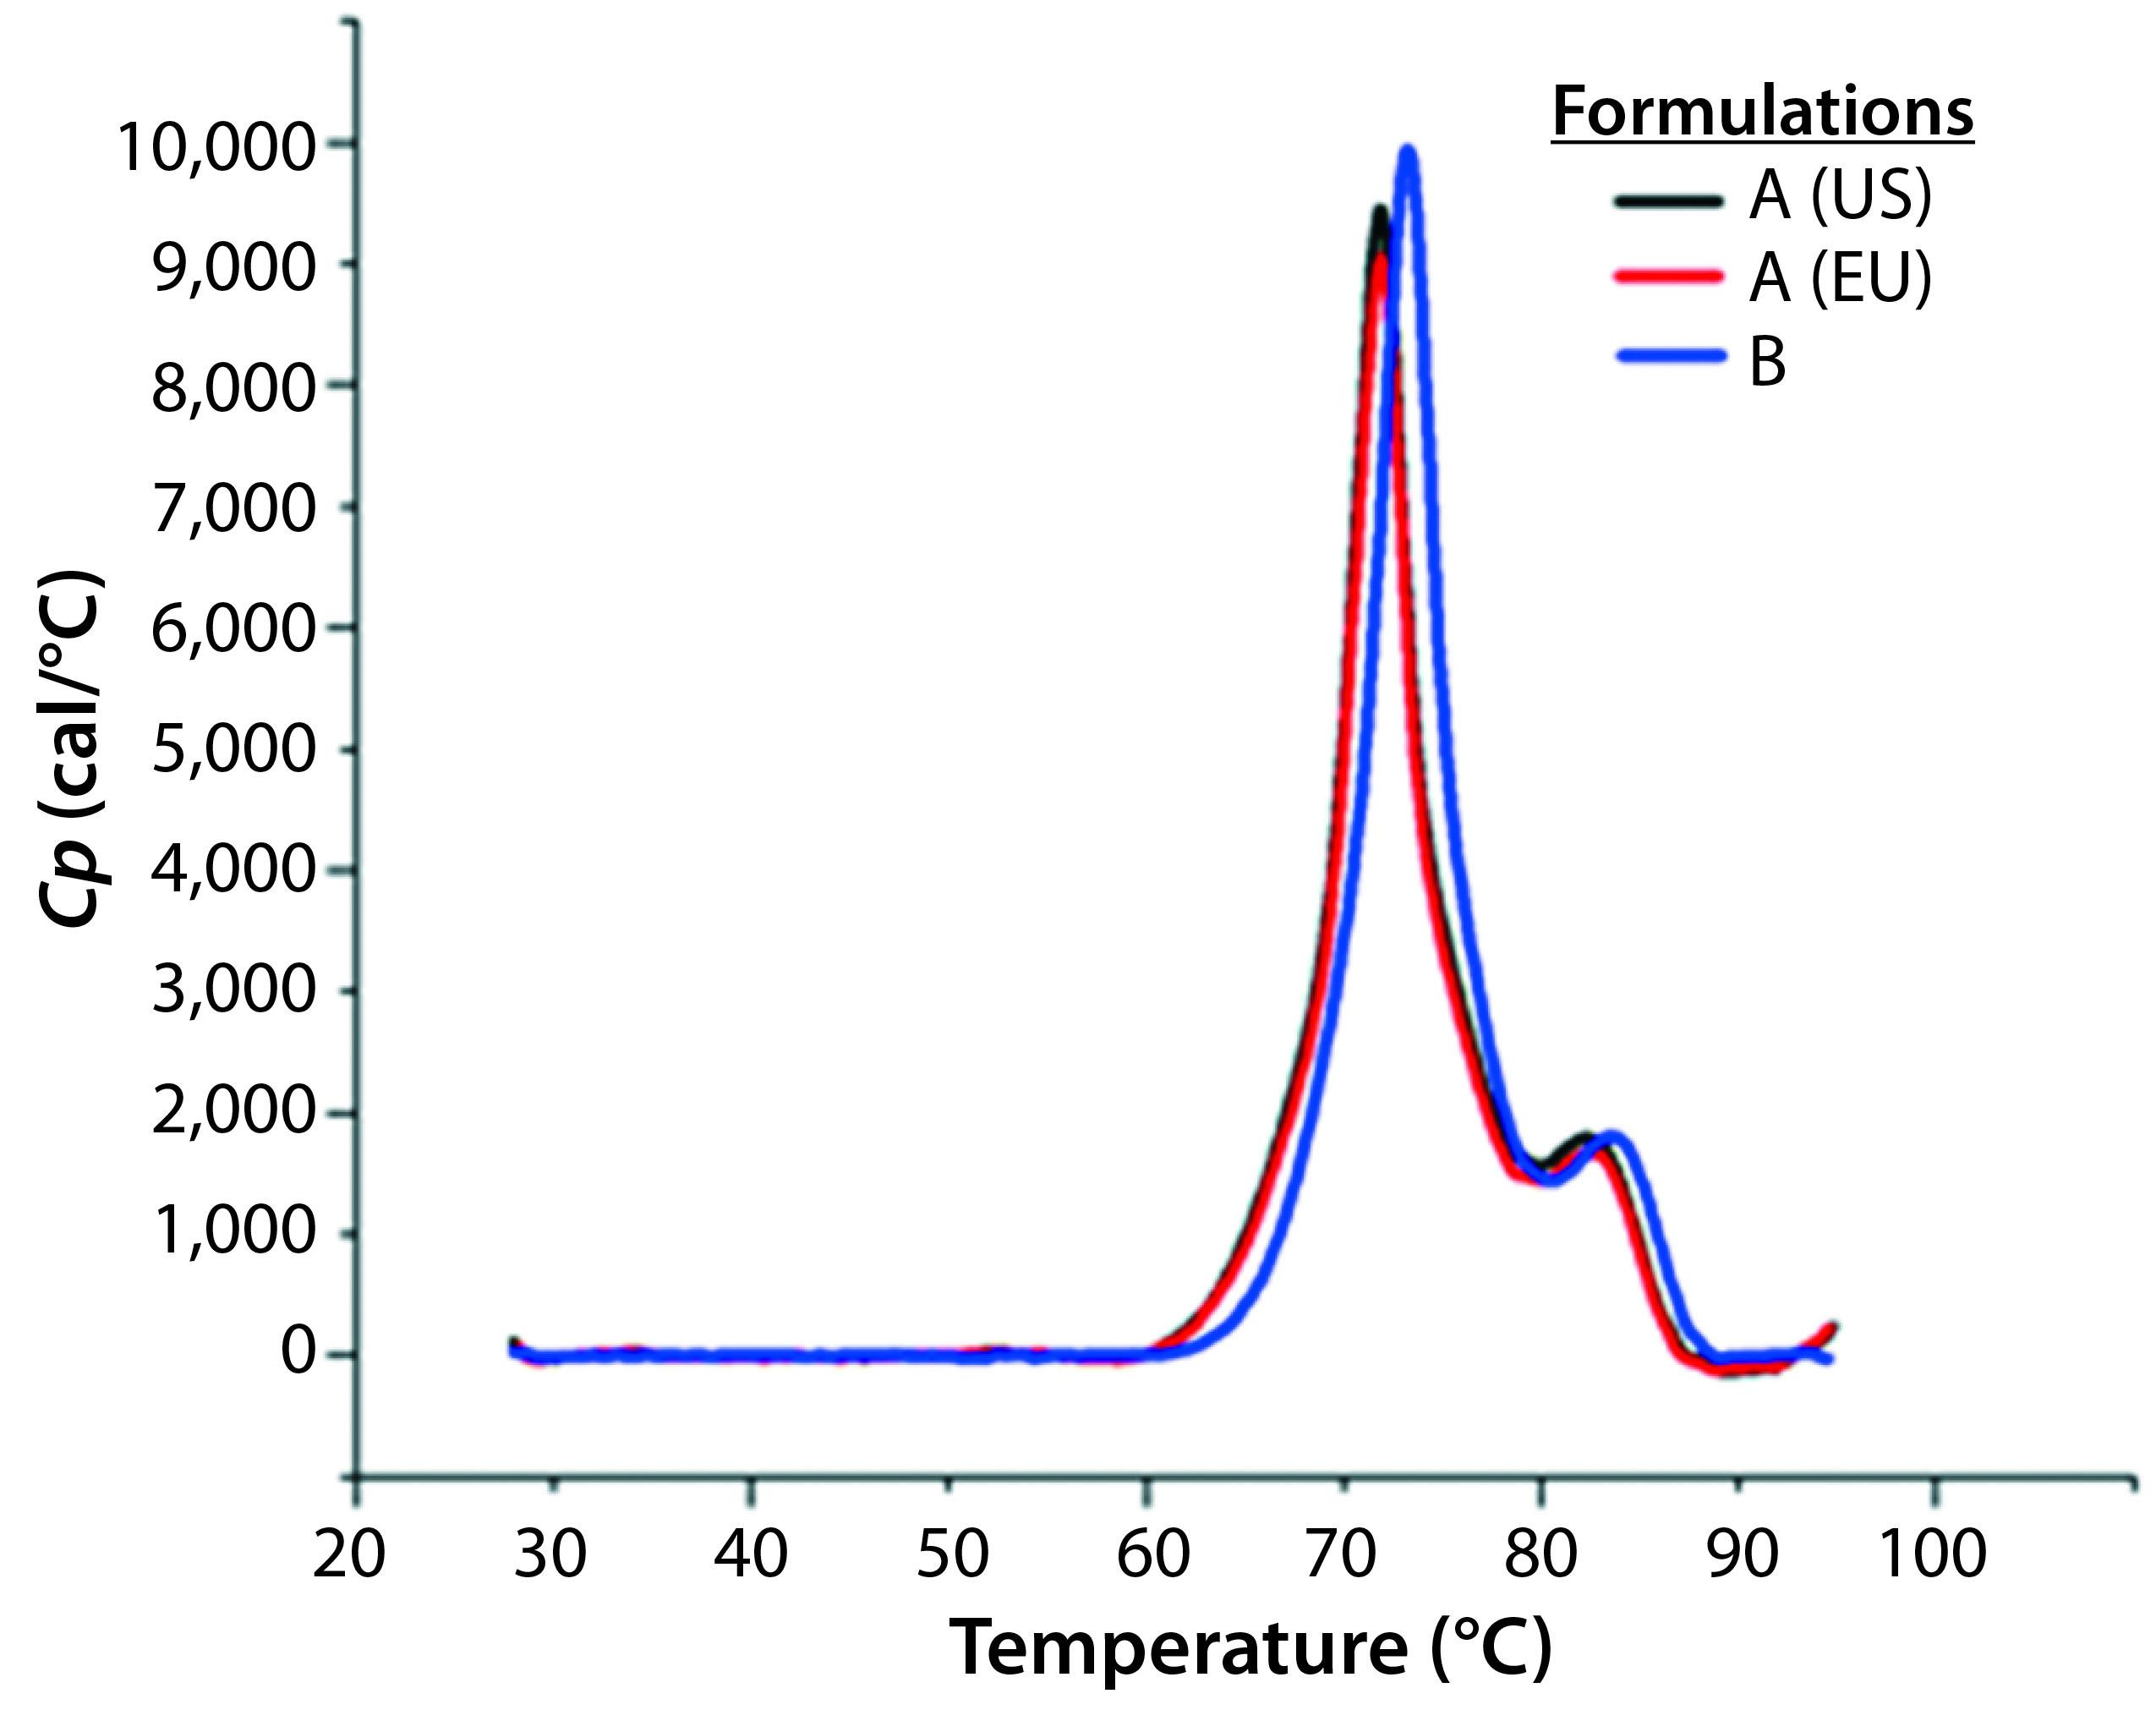 Rational Design of Biopharmaceutical Formulations